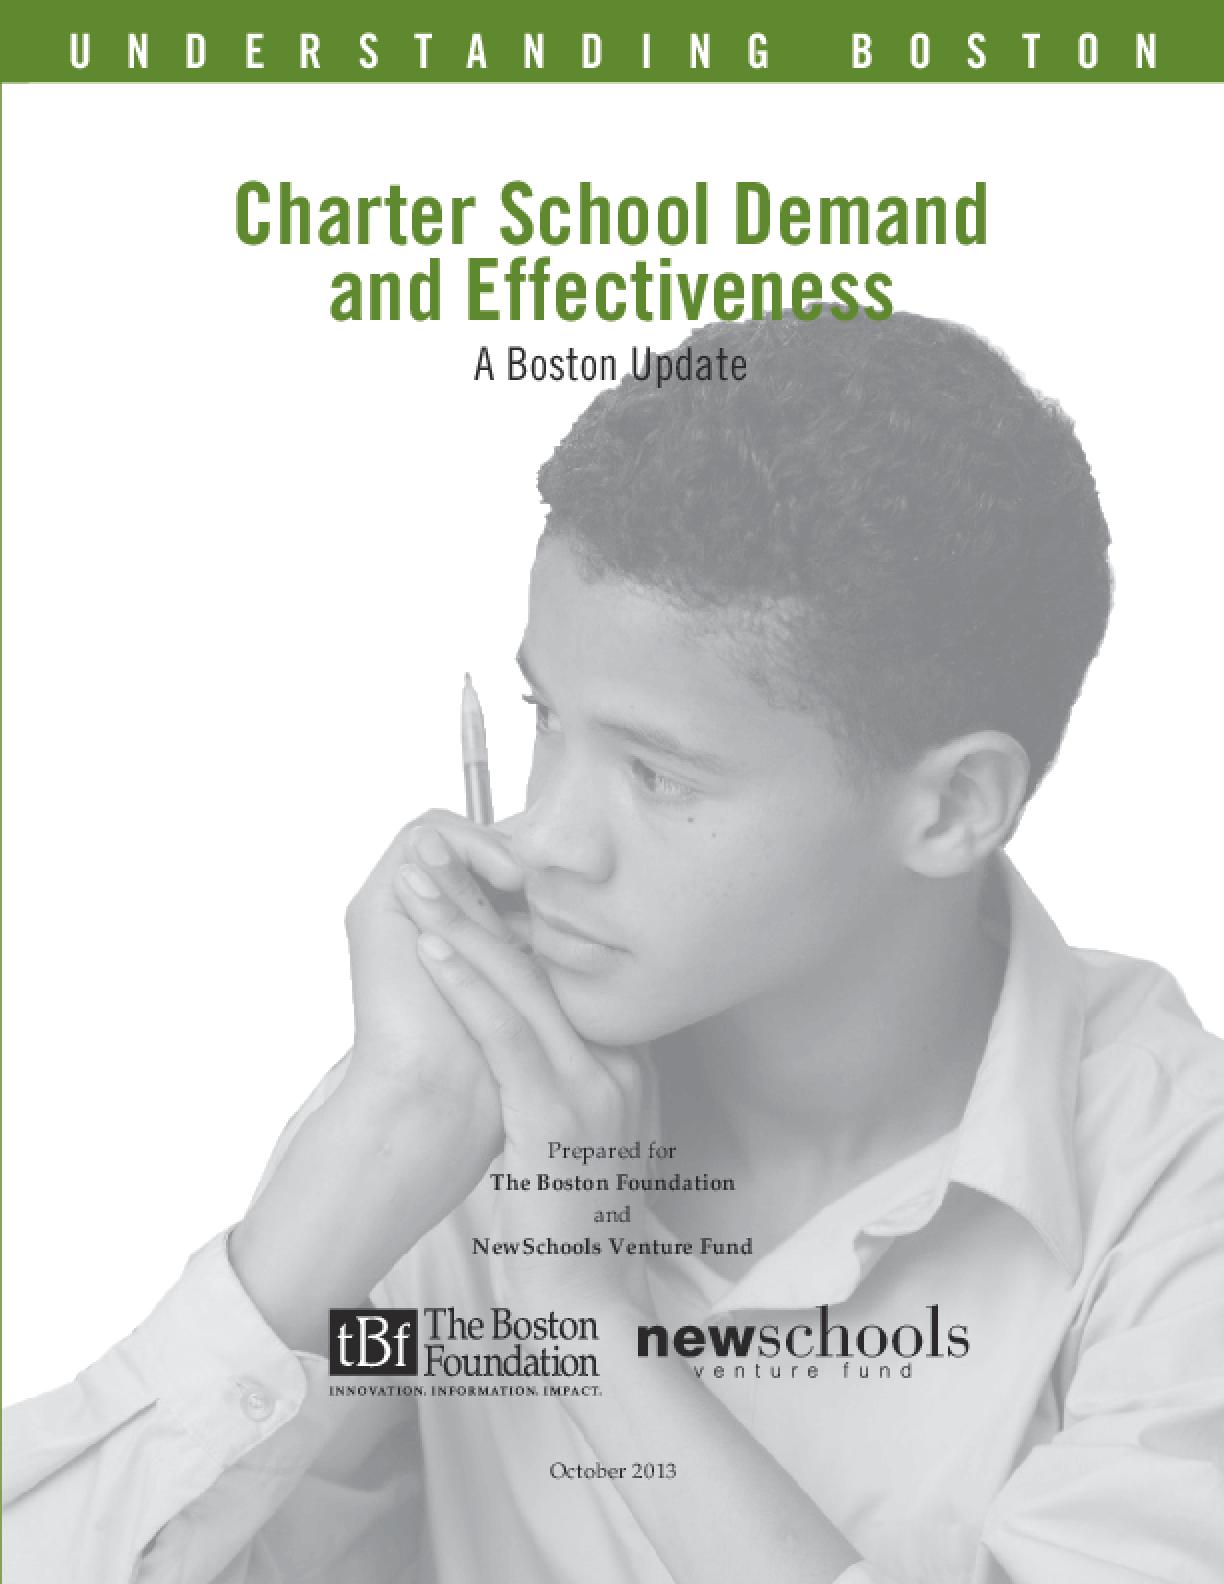 Charter School Demand and Effectiveness: A Boston Update